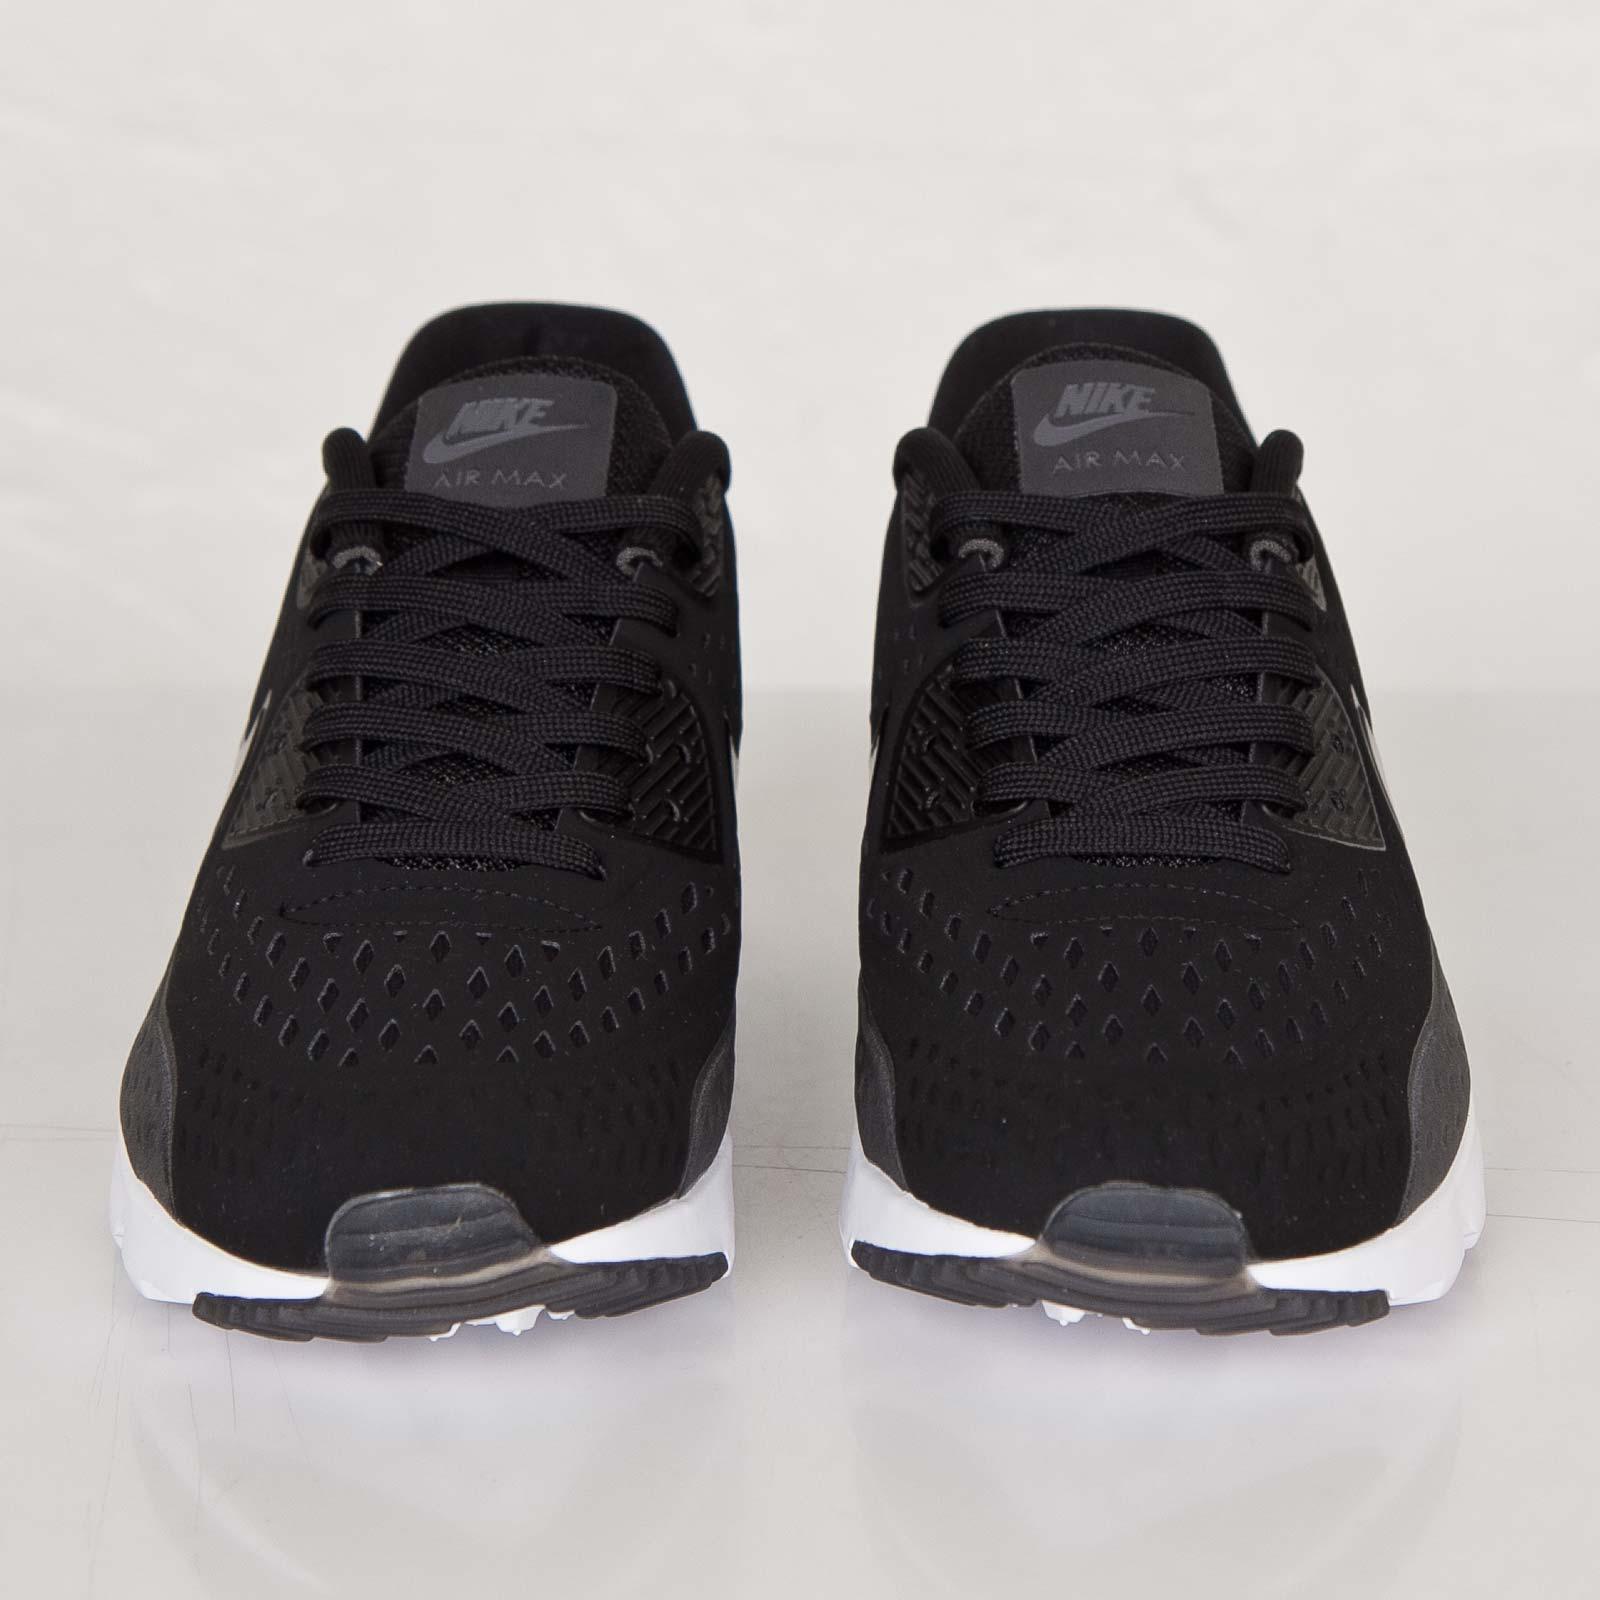 wholesale dealer 192a6 af63f Nike Air Max 90 Ultra Br - 725222-001 - Sneakersnstuff   sneakers    streetwear online since 1999